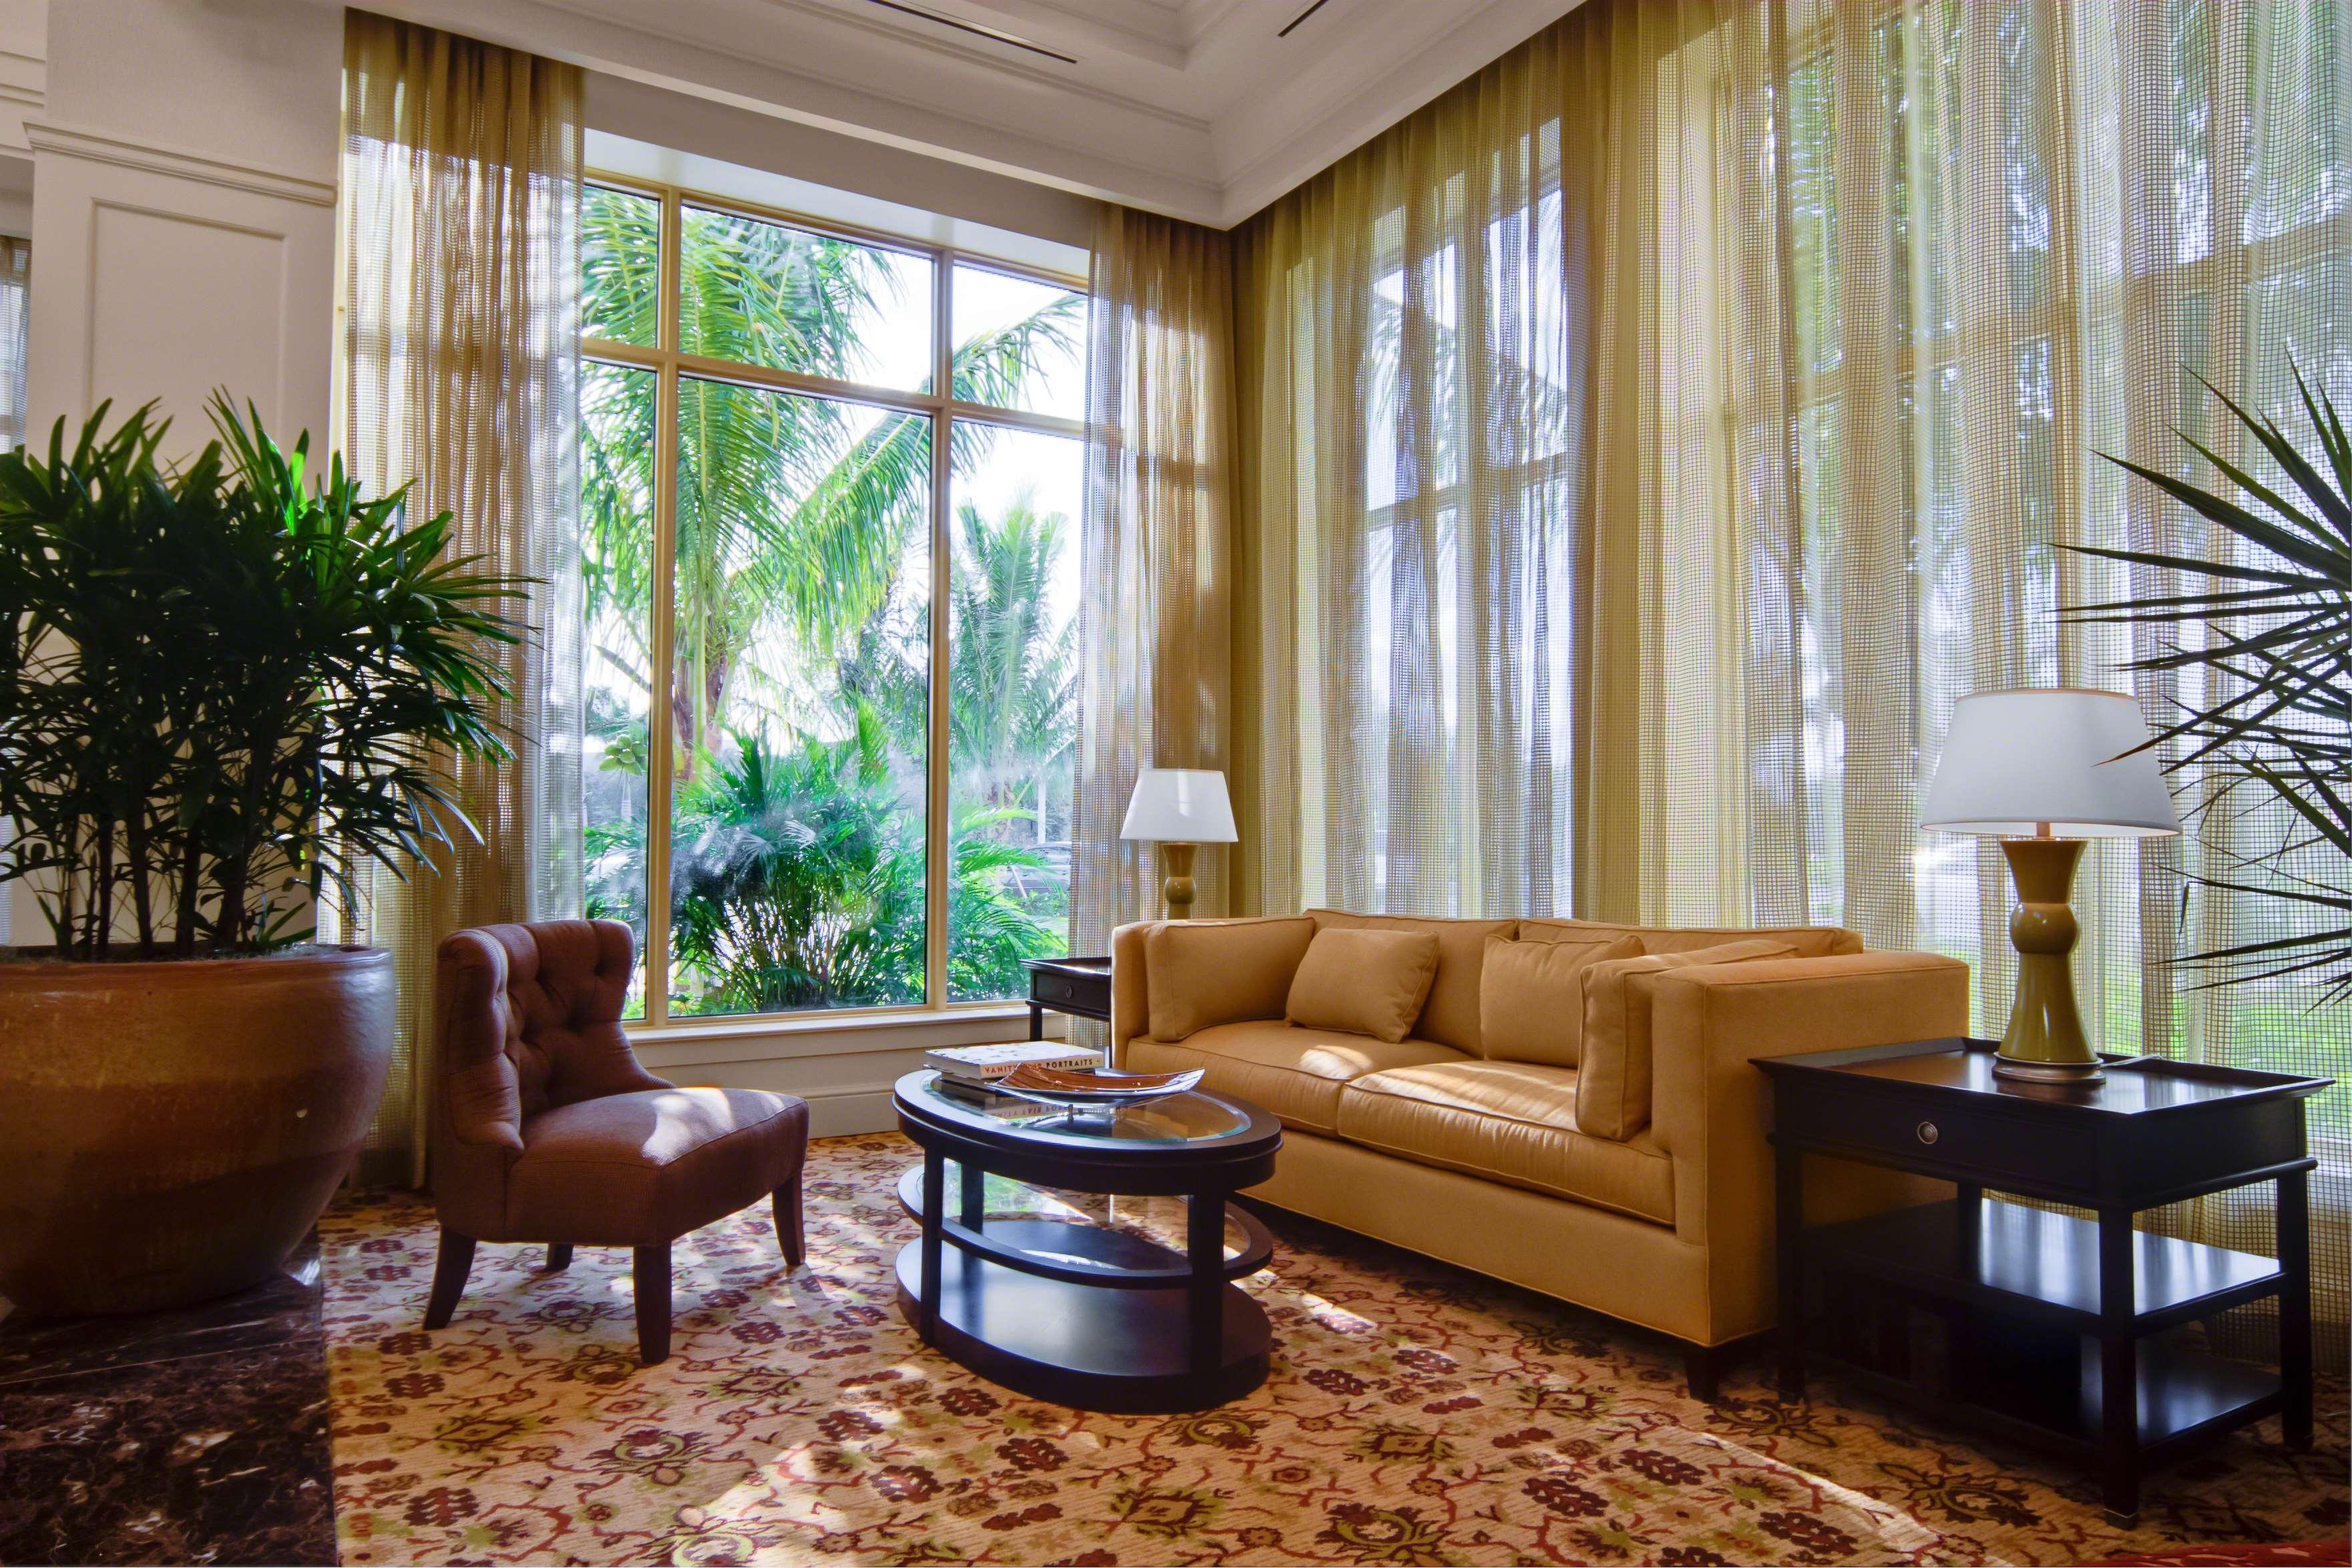 Hilton Garden Inn Palm Beach Gardens image 2